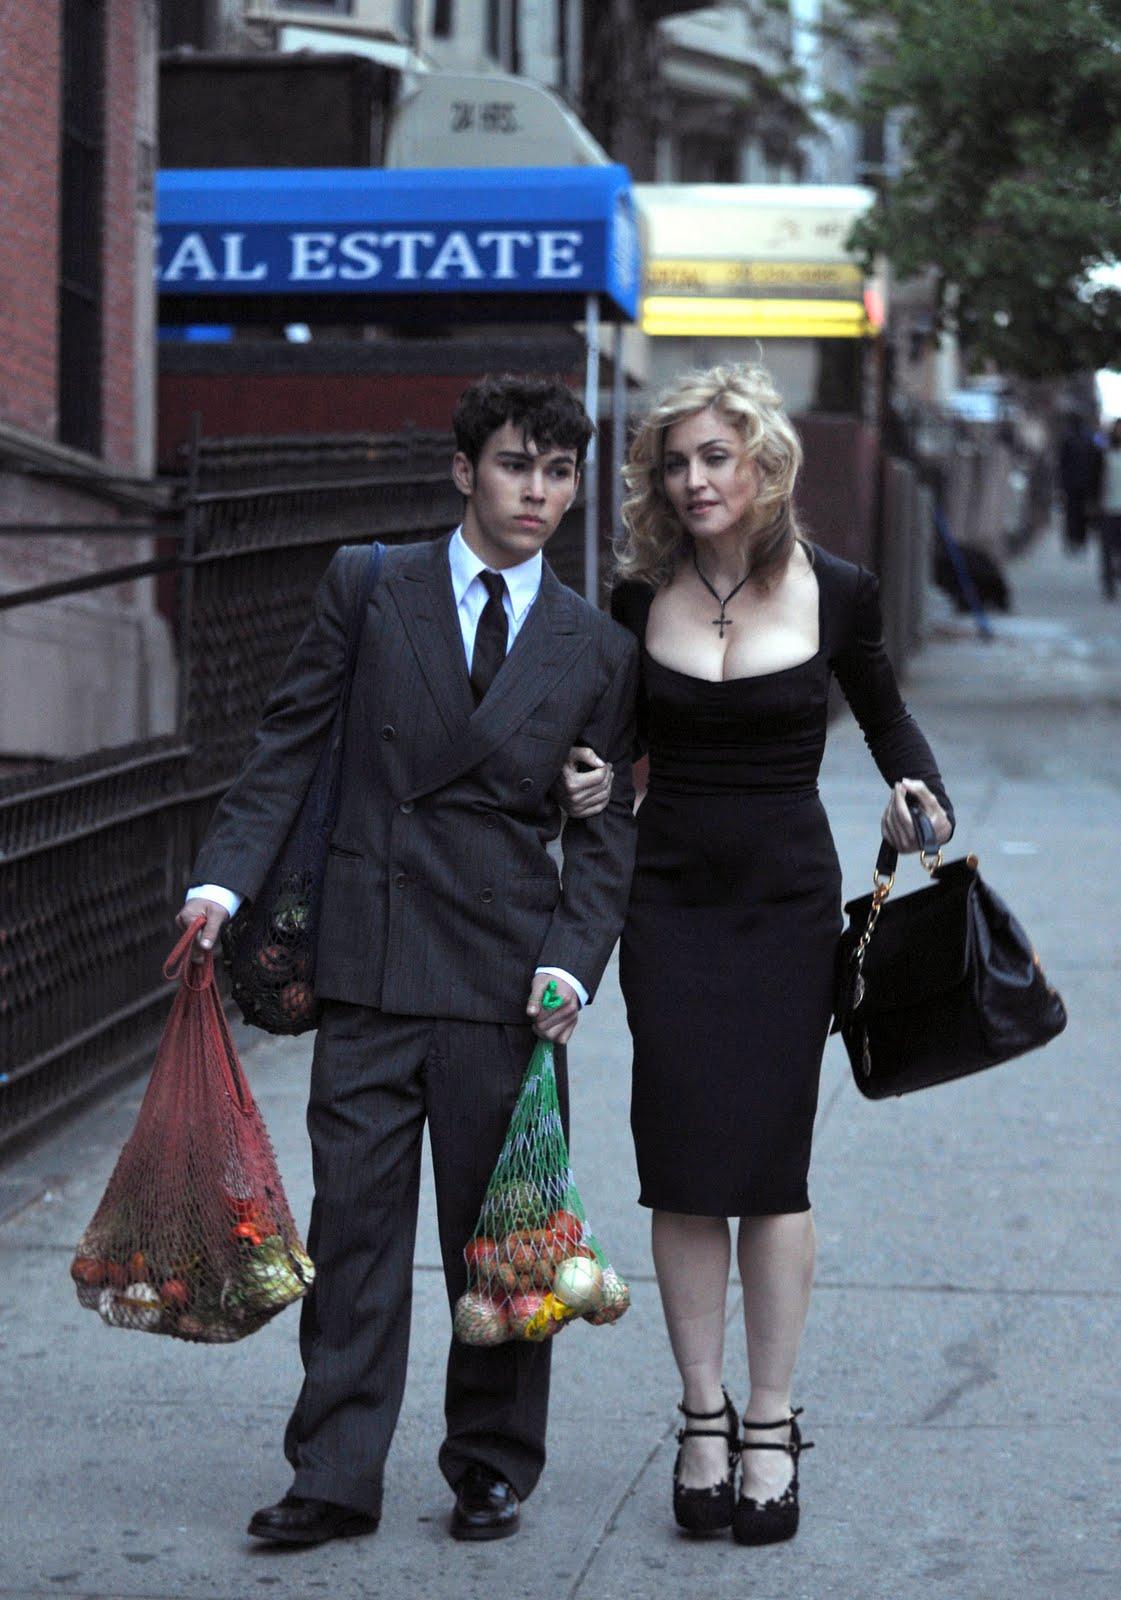 http://4.bp.blogspot.com/_KTqLxxzc3H0/S9WNSfUje3I/AAAAAAAANAM/_AhYEA9nJ7E/s1600/86JDFSILIR_Madonna_Shoots_for_Dolce__Gabbana_Fall_2010_Campaign_002.jpg